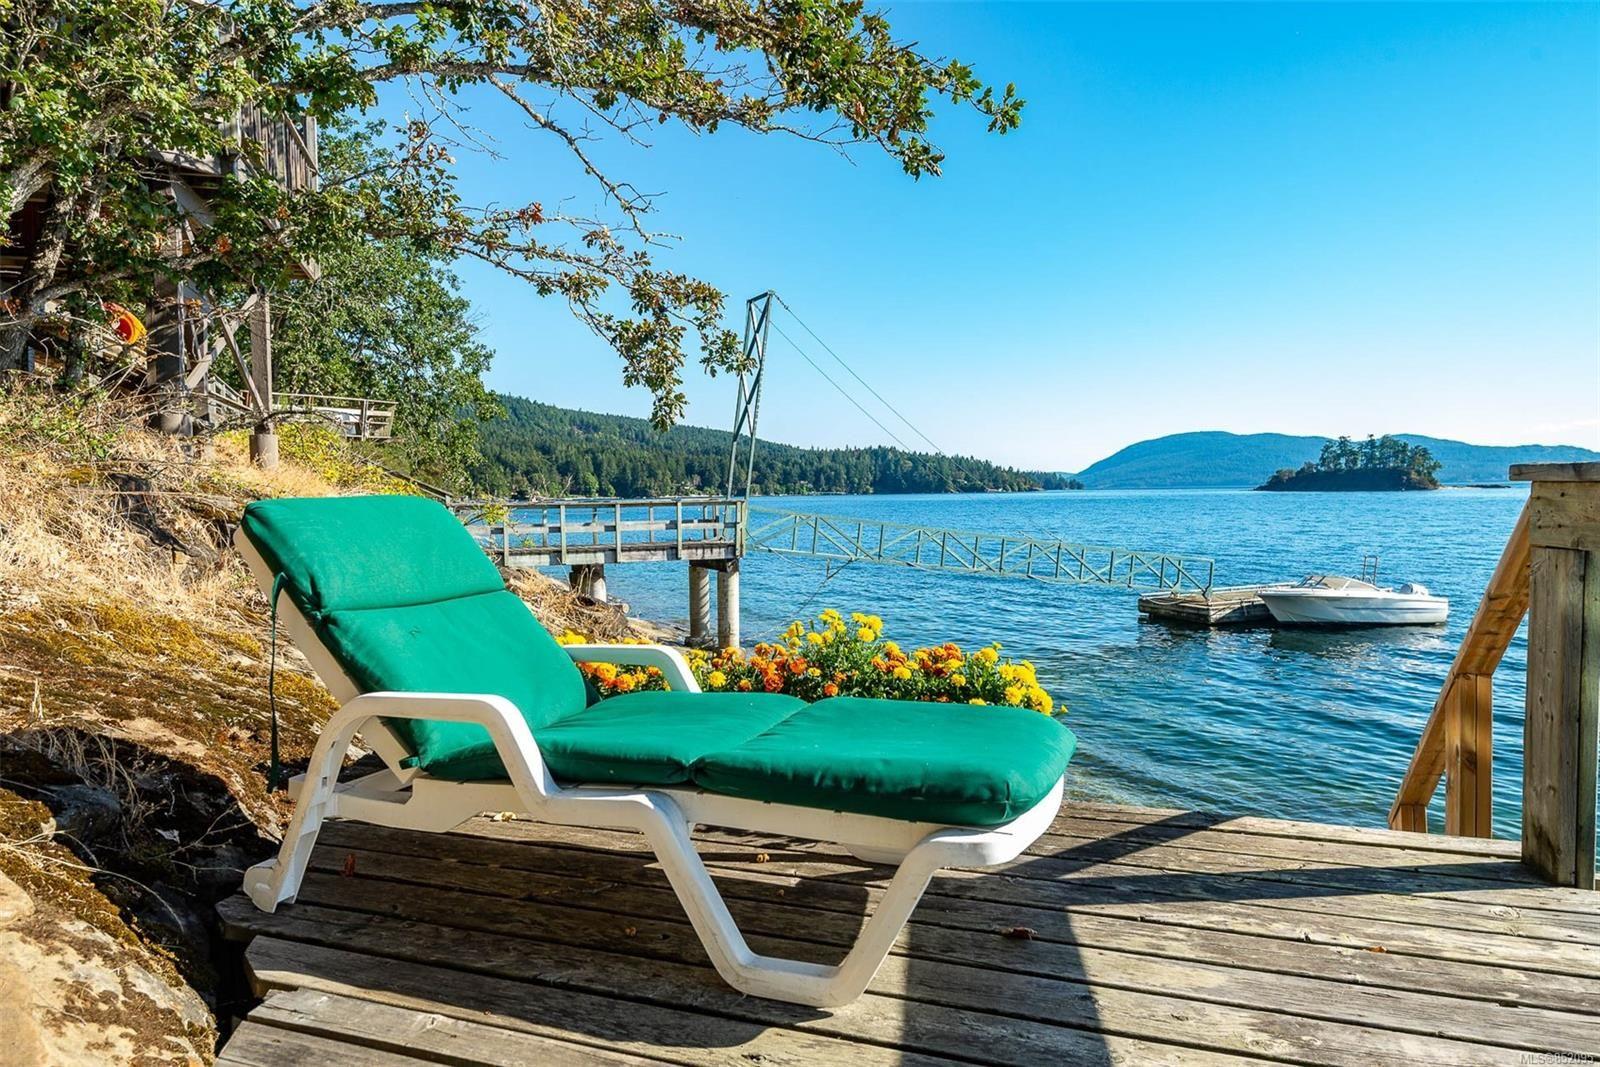 Photo 20: Photos: 236 McGill Rd in : GI Salt Spring House for sale (Gulf Islands)  : MLS®# 852095